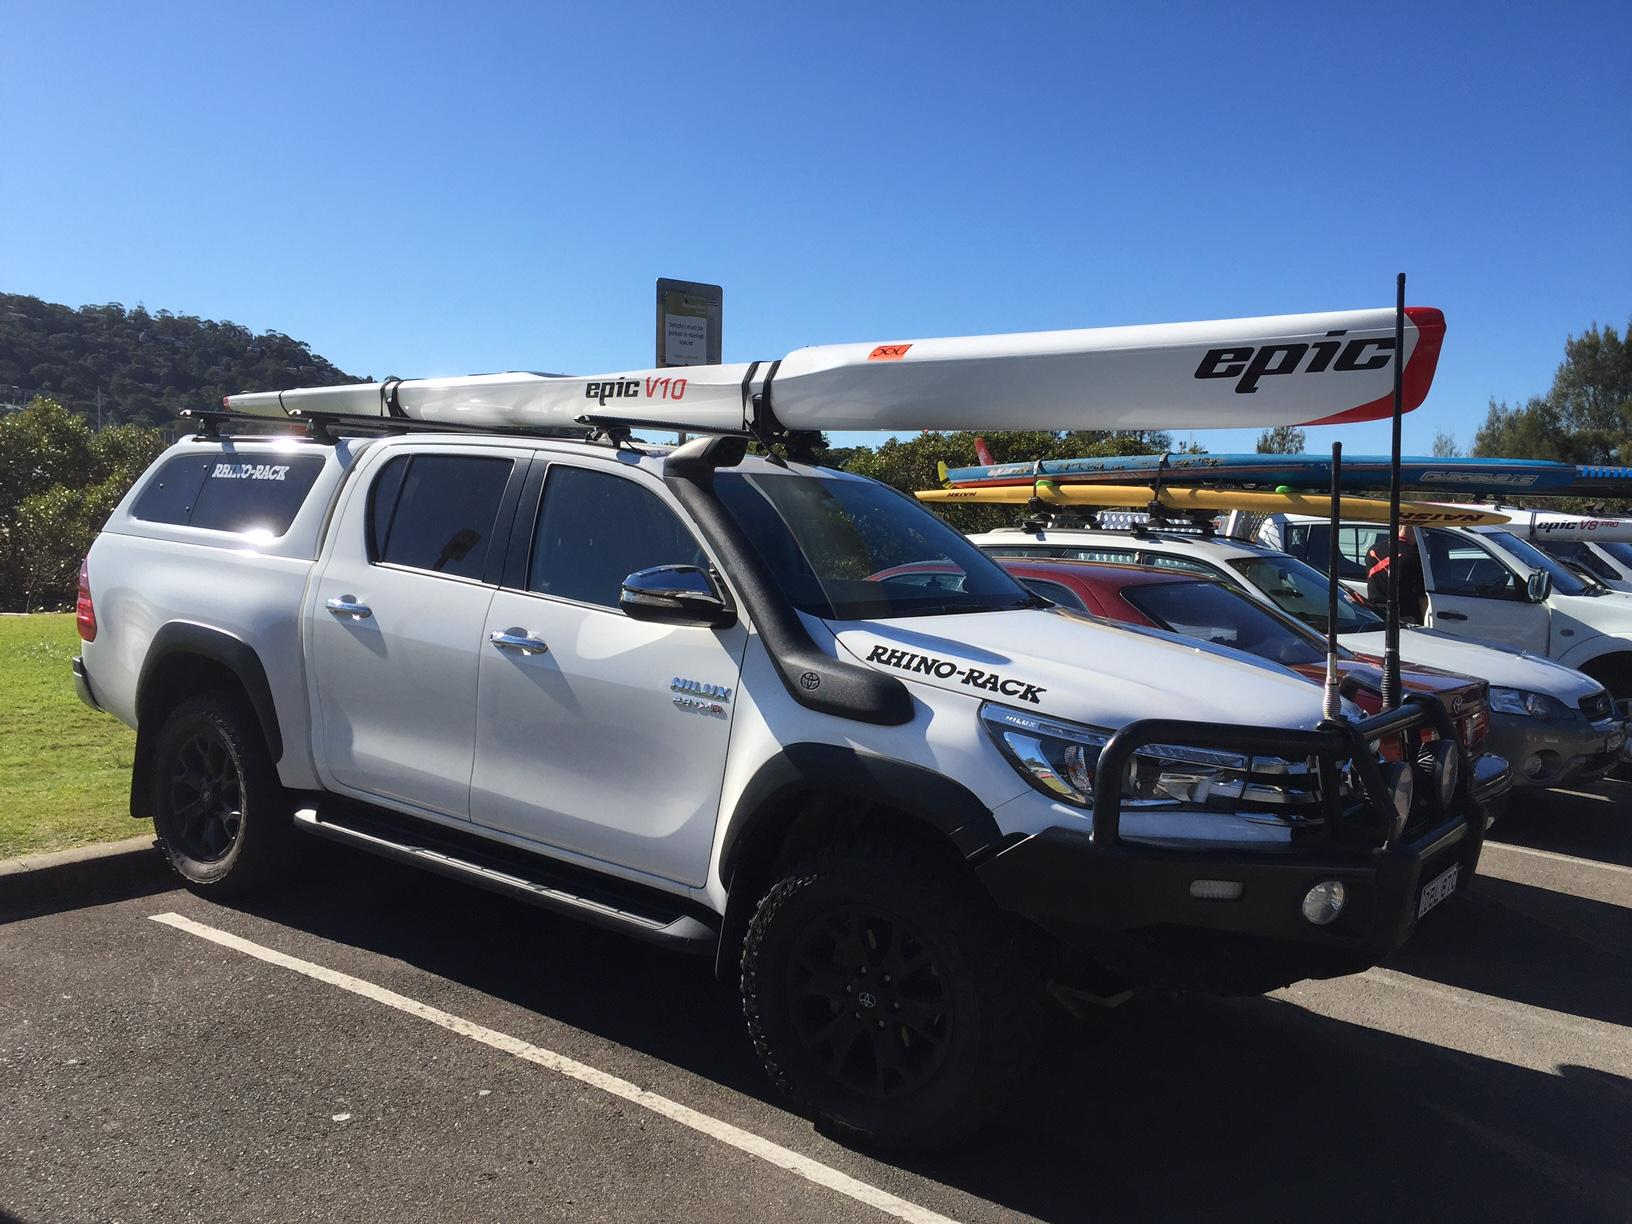 Racing kayak on Toyota Hilux roof